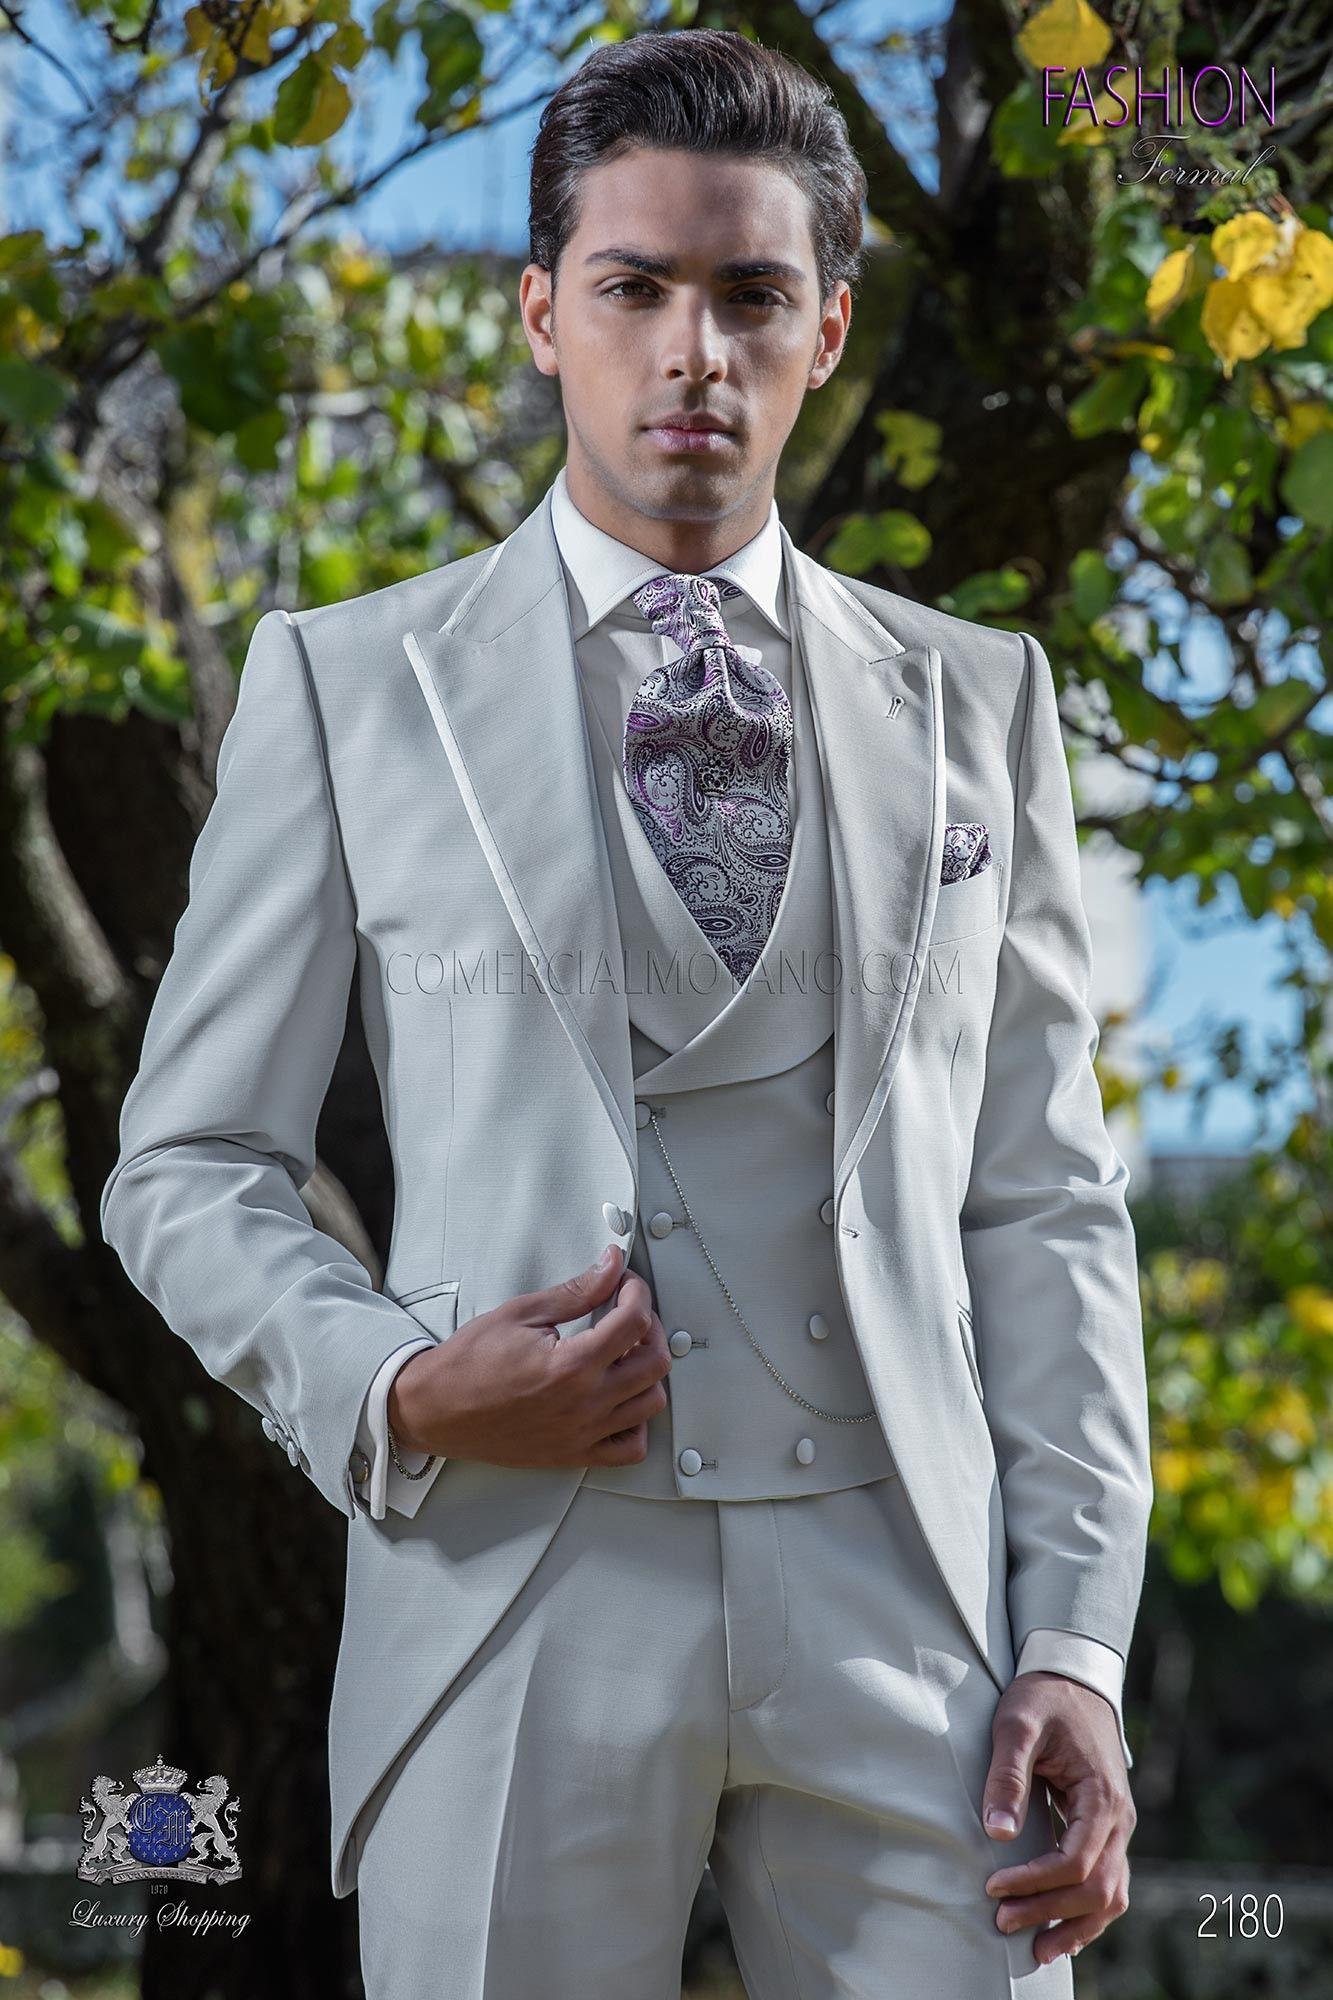 Costume de mariage levité Gris perle microdesign | Frock coat and ...